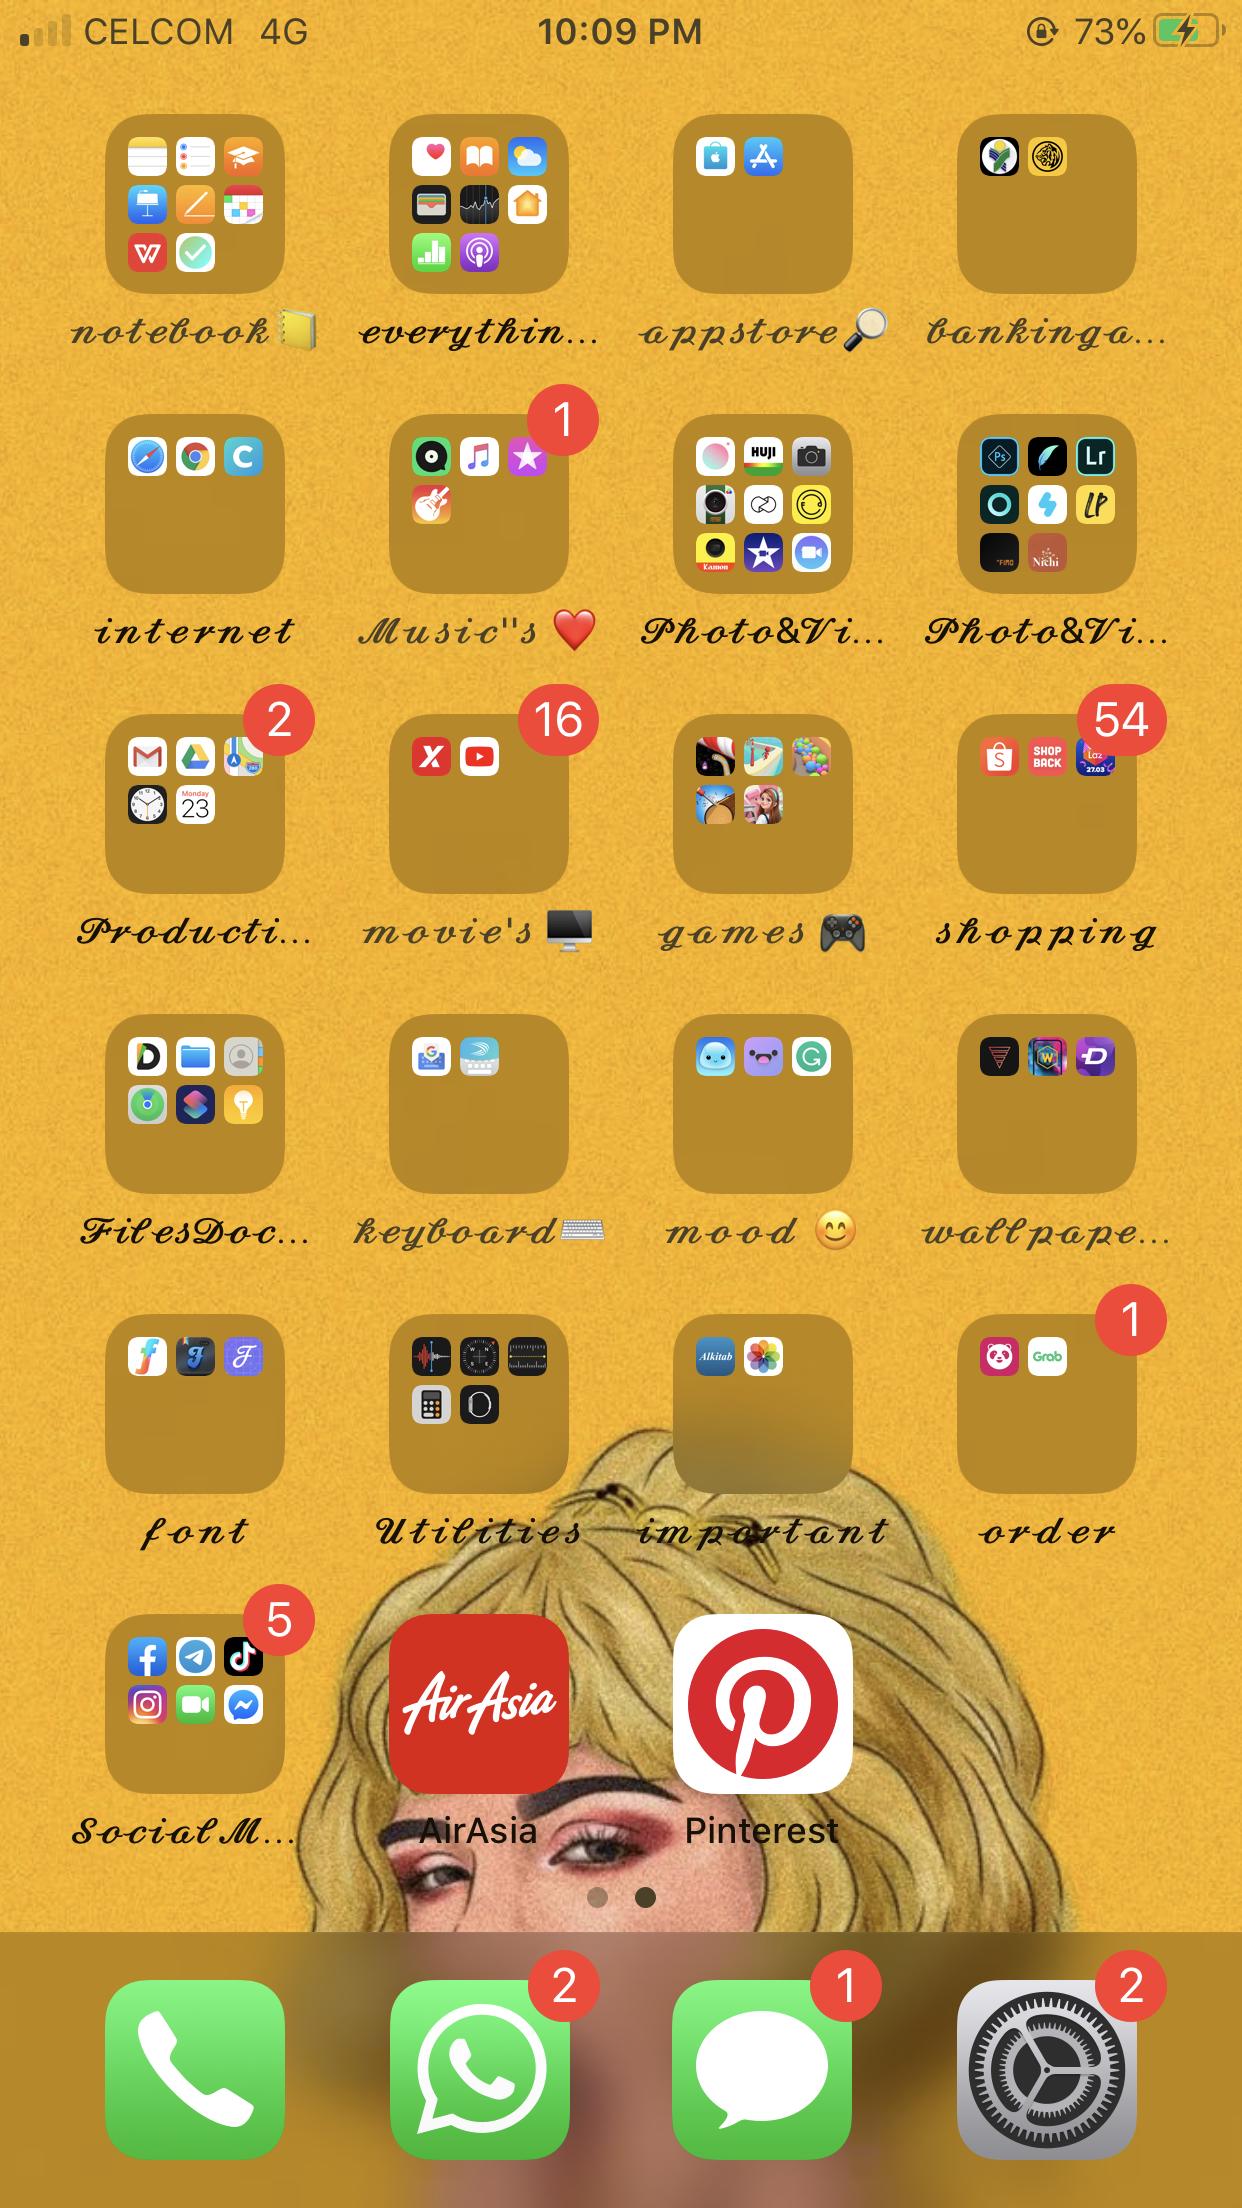 Idea For Iphone Homescreen In 2020 Aesthetic Iphone Wallpaper Iphone Hacks Homescreen